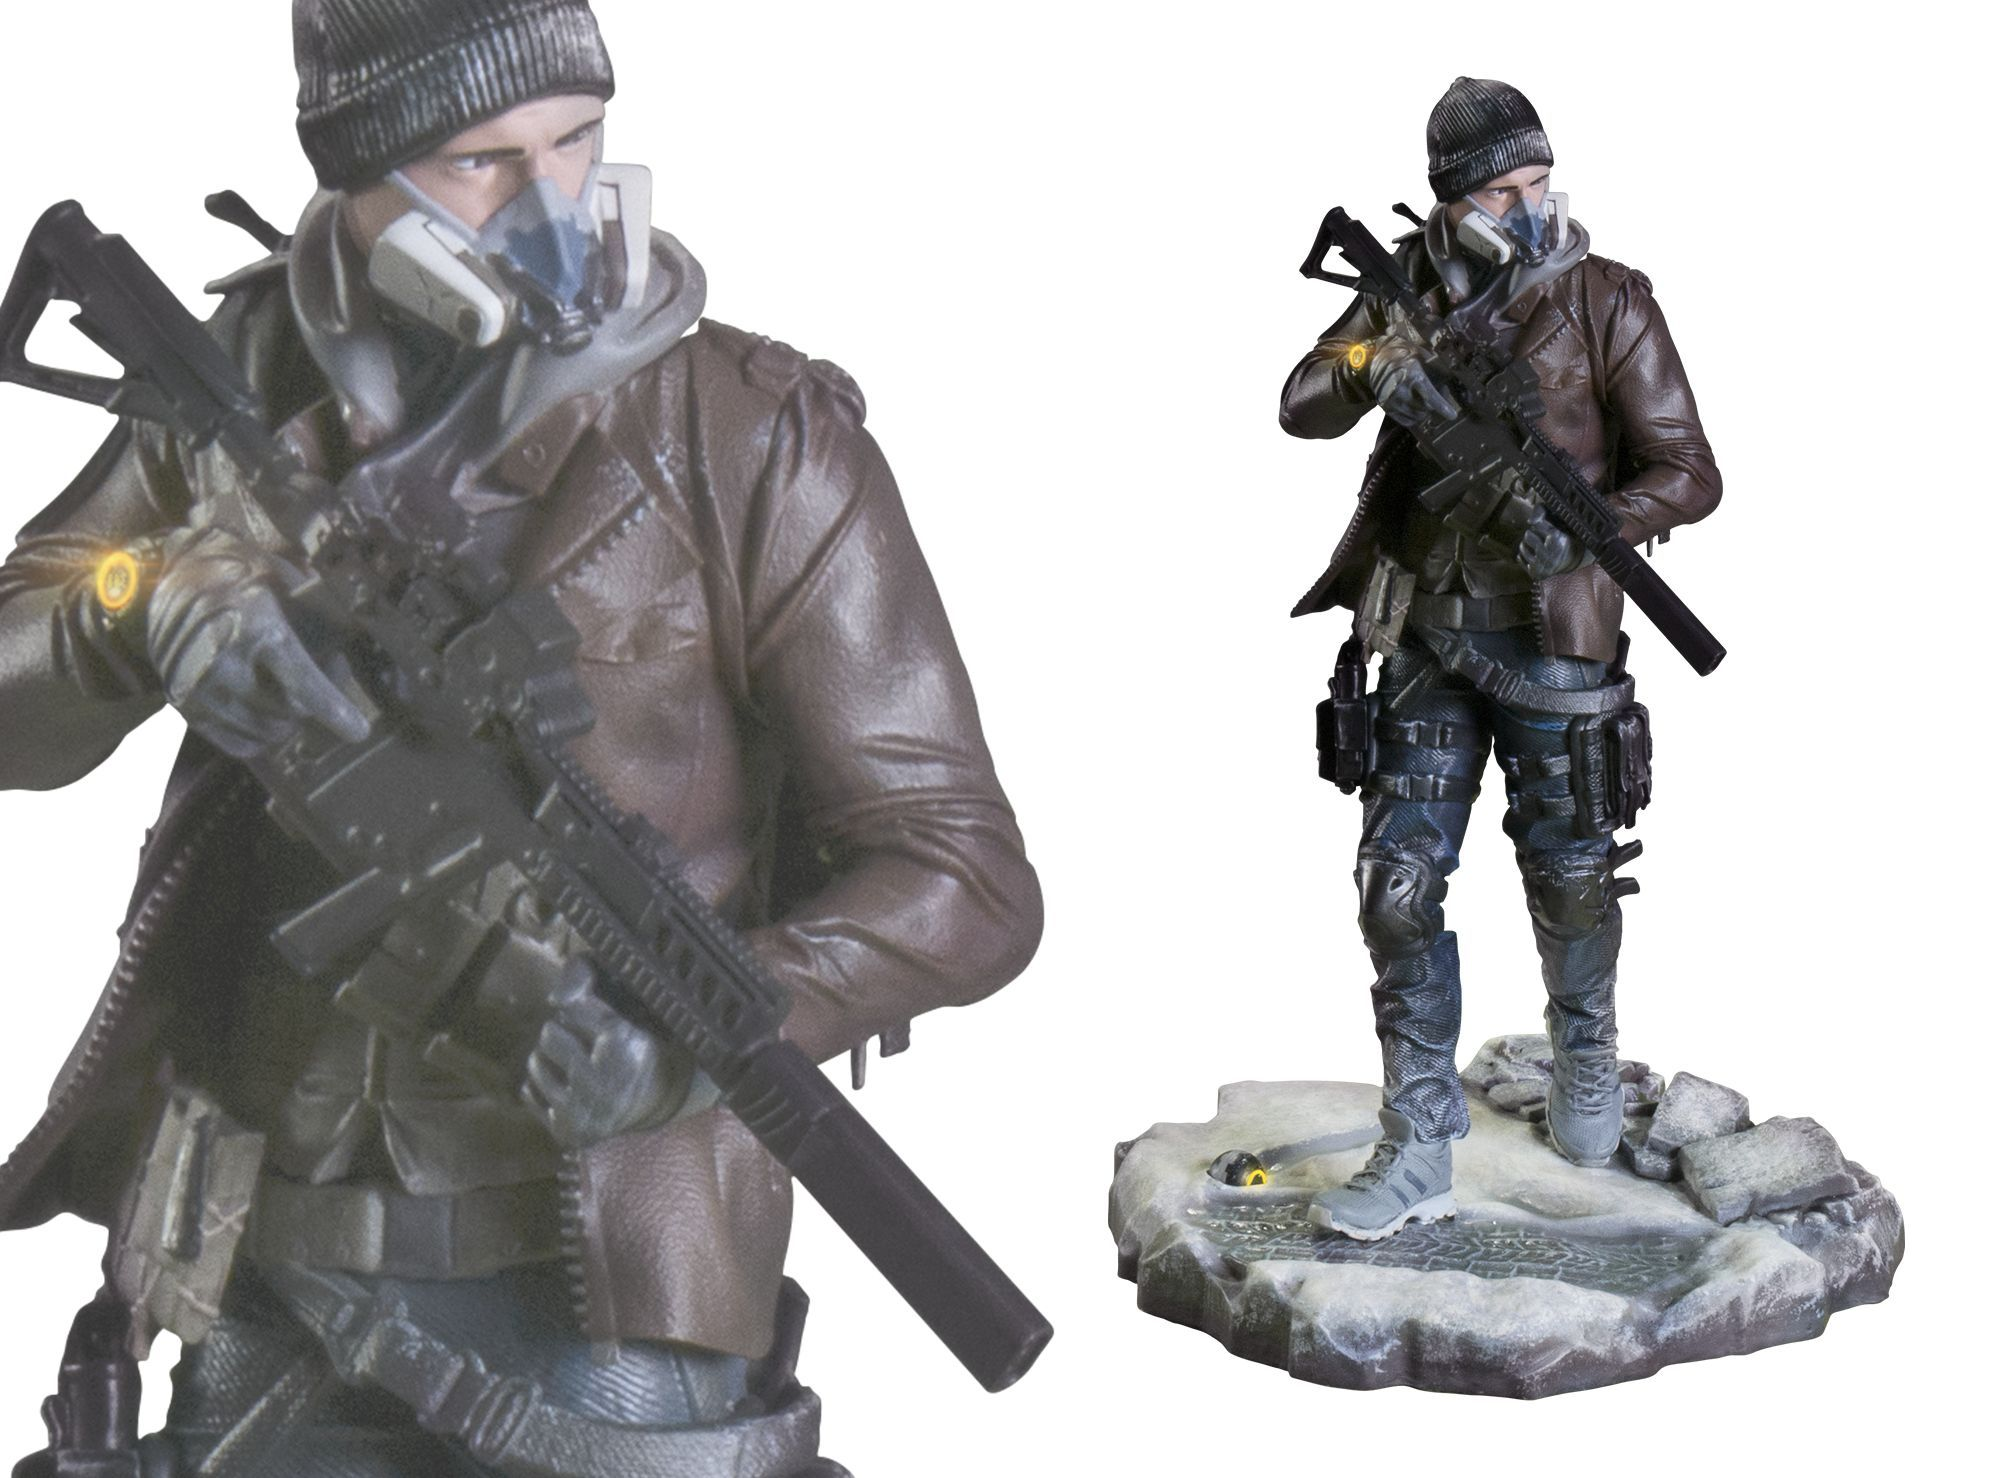 Фигура Tom Clancy's The Division - Male Agent, 24cm - 3